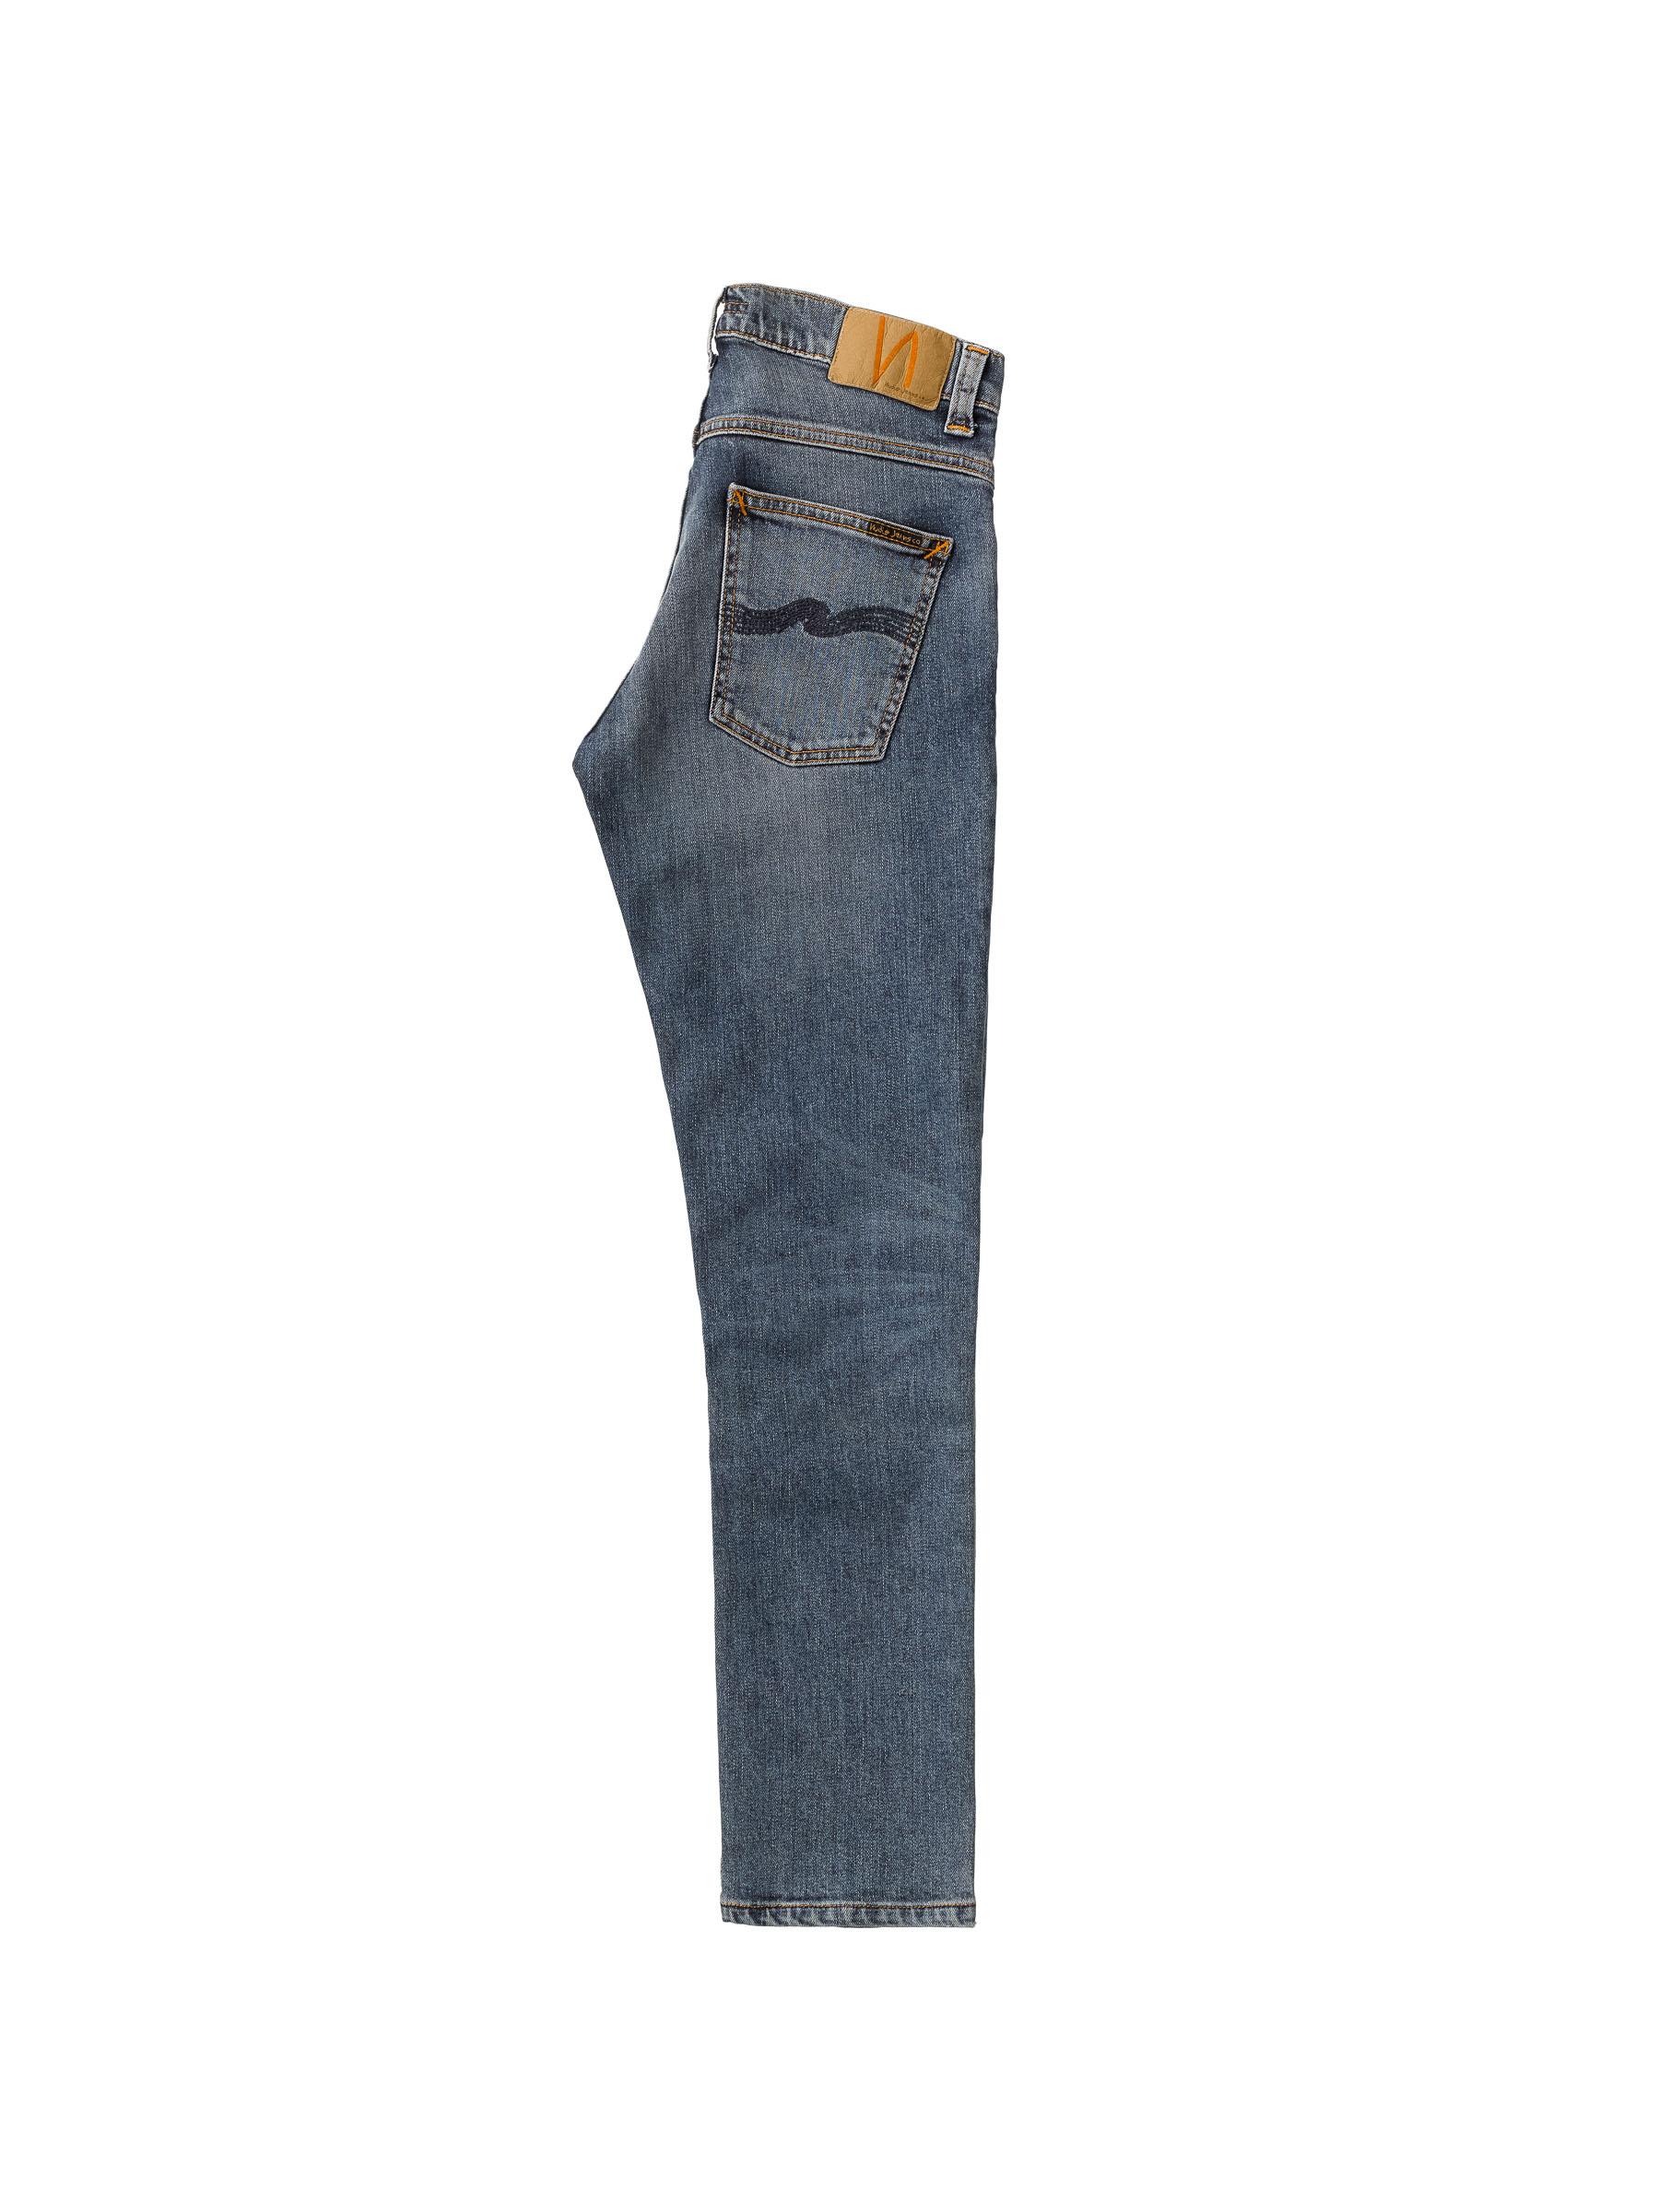 Nudie Jeans - GRIM TIM - Ojai Blues